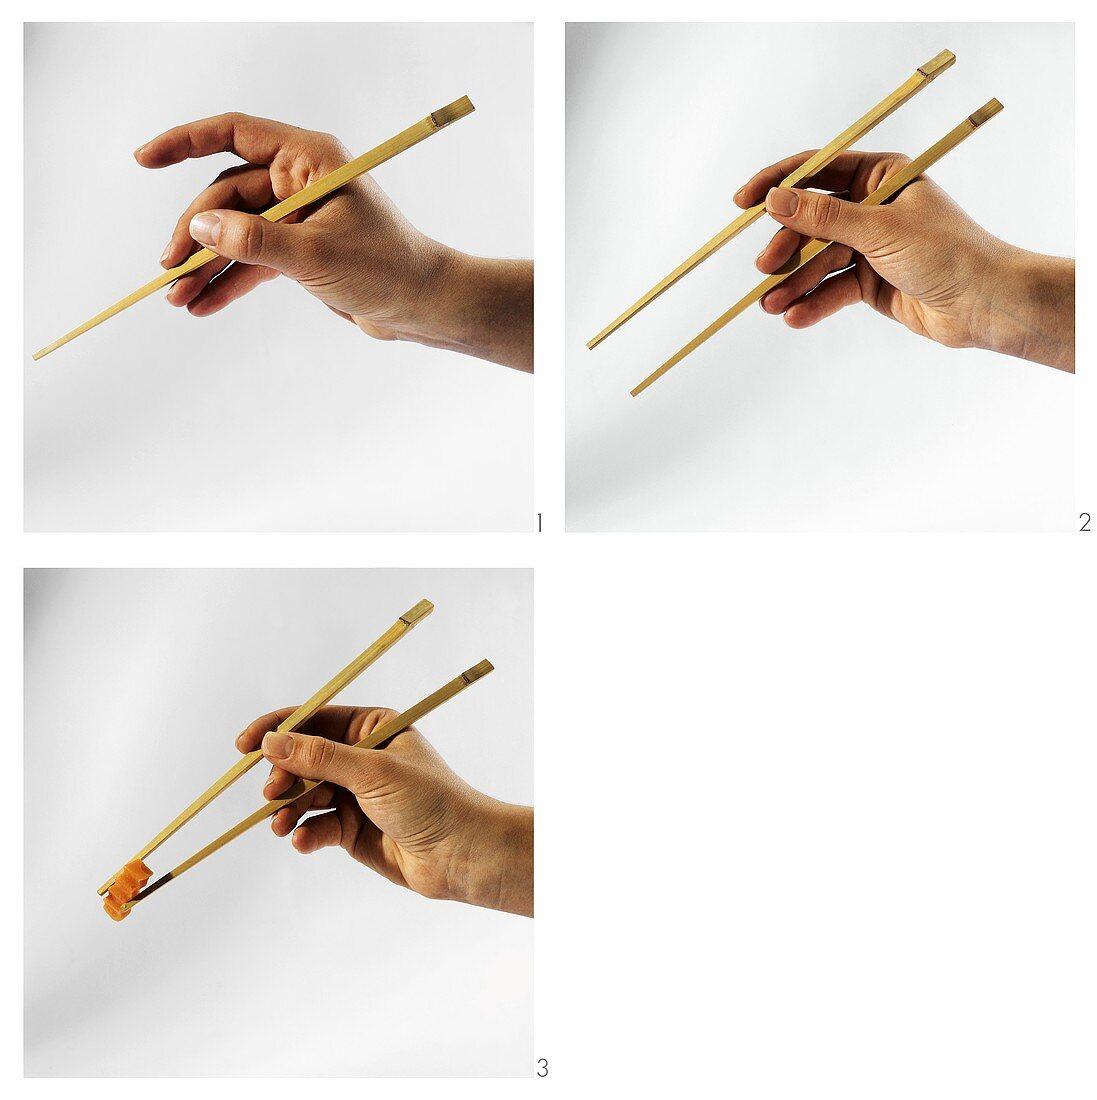 Instructions for using chopsticks